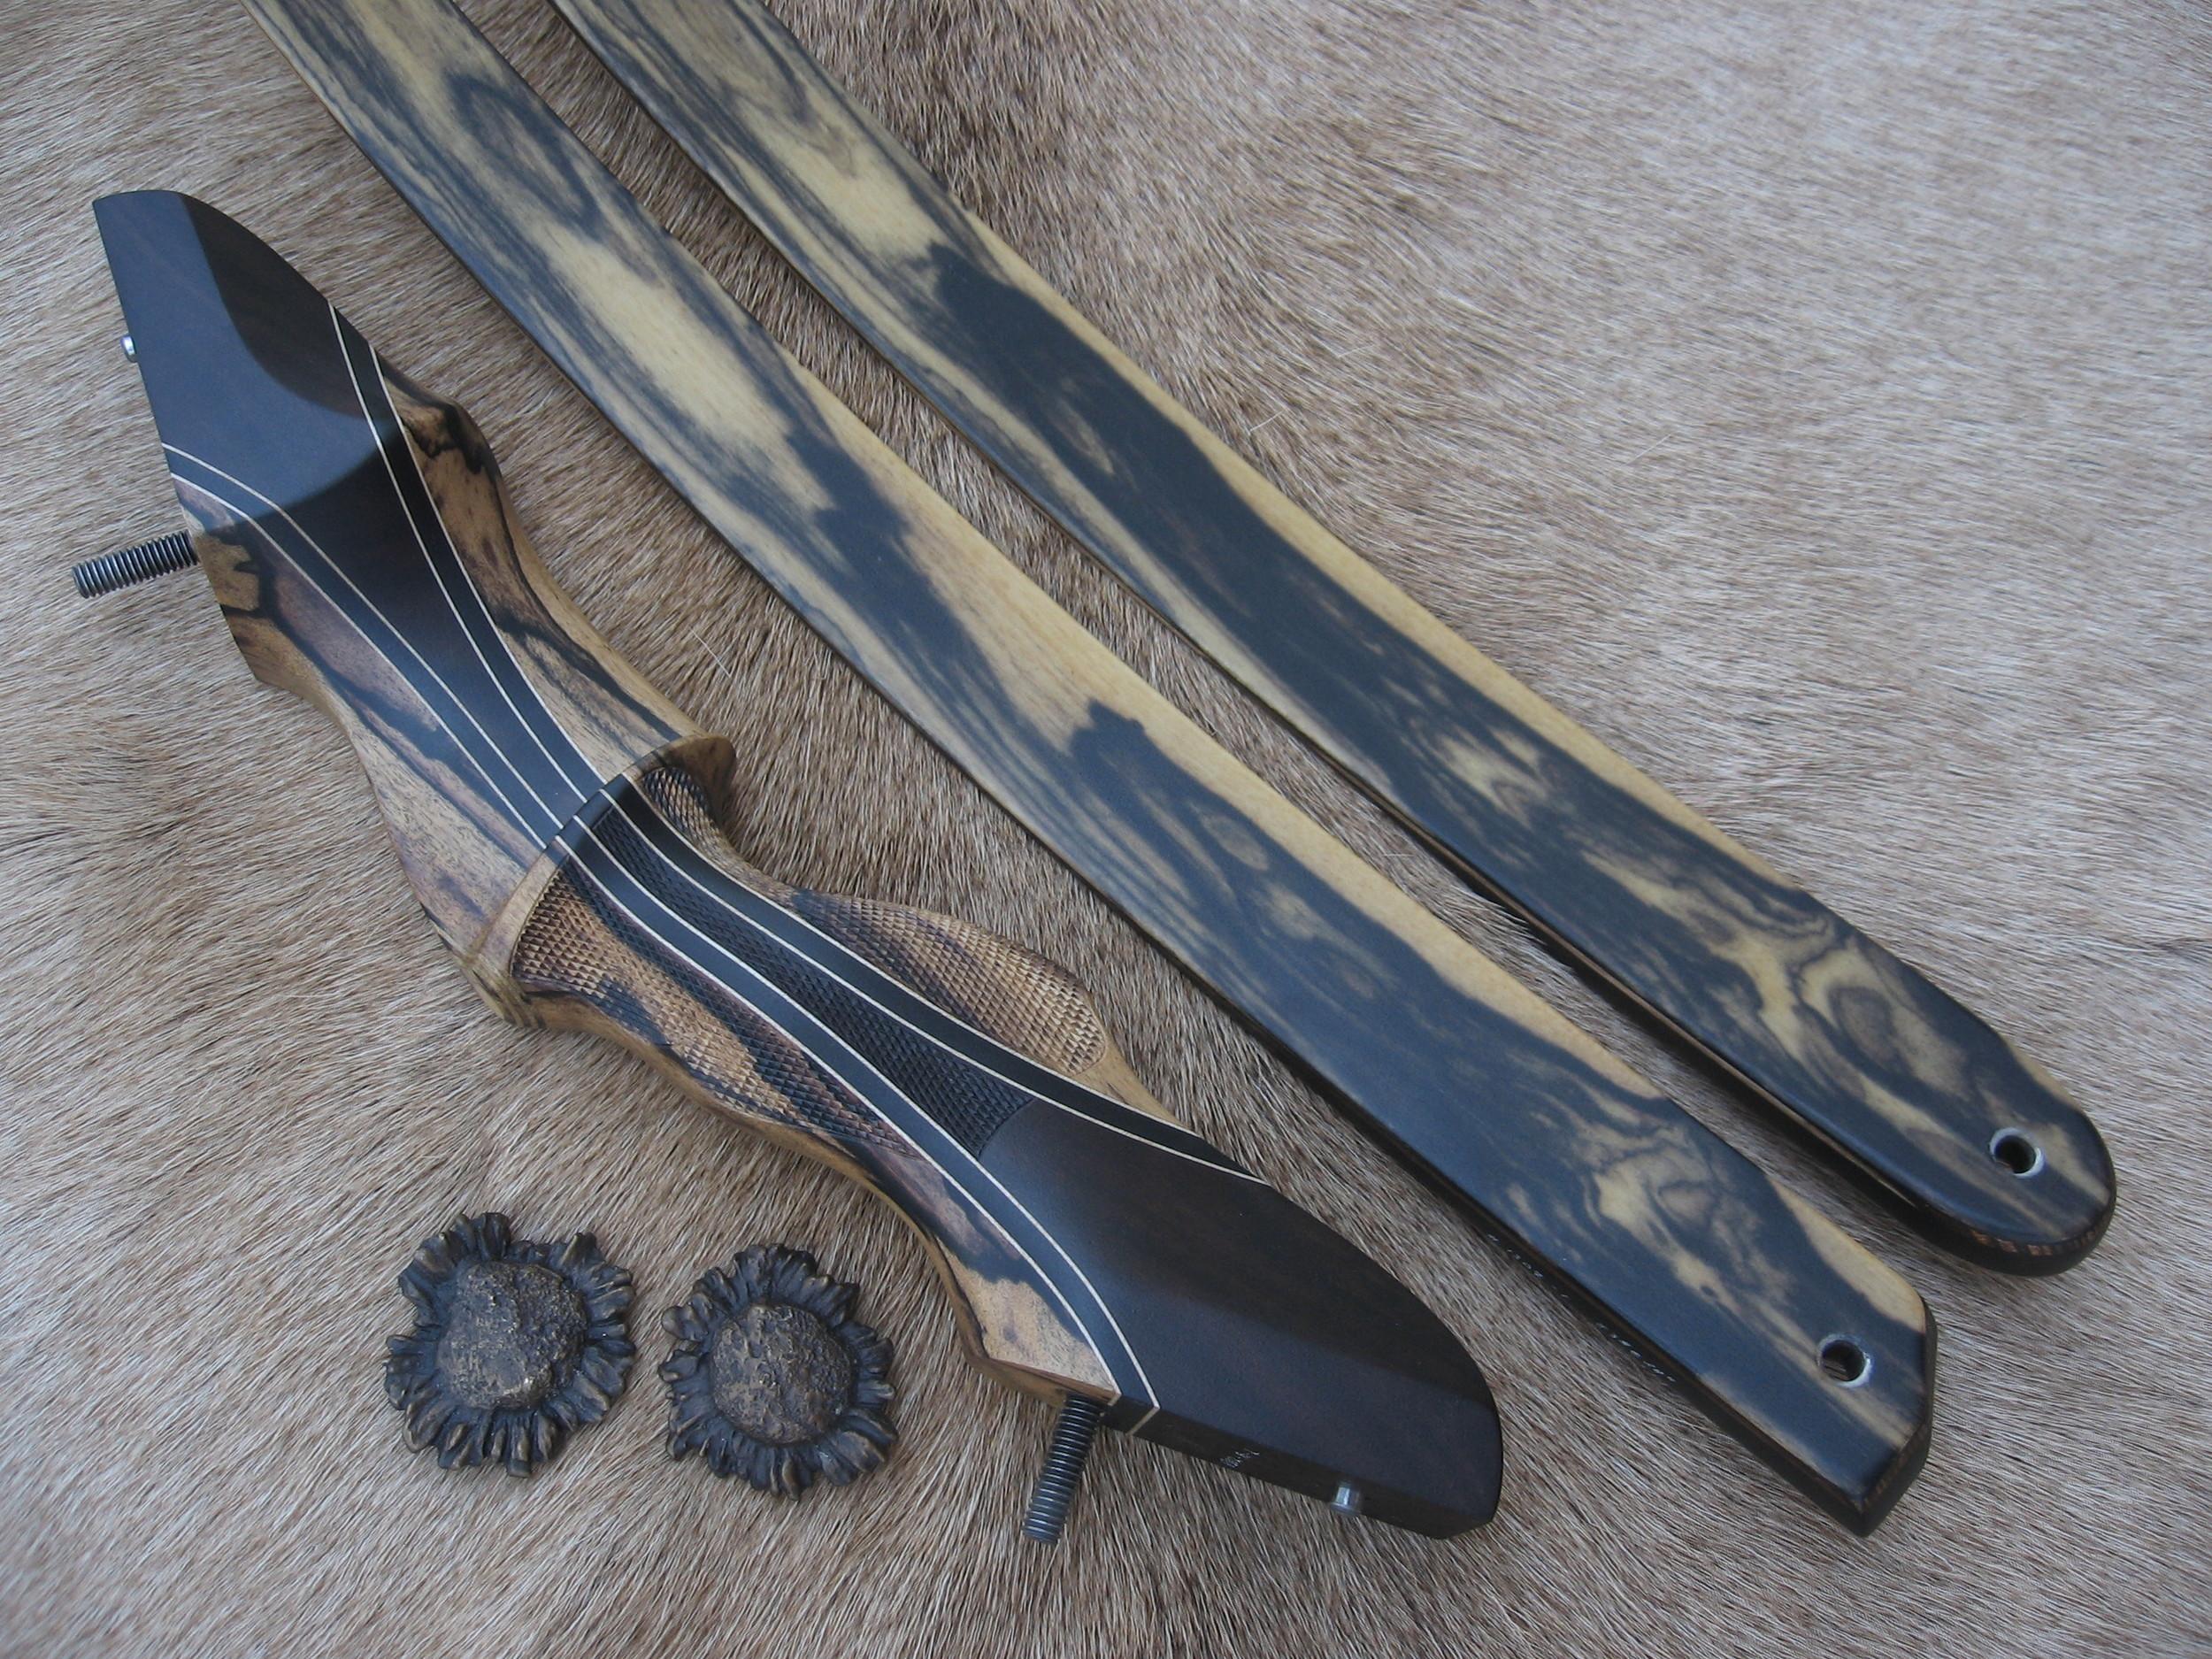 Black and White Ebony Riser w/ Gaboon Ebony Flare- Black and White Ebony Limbs